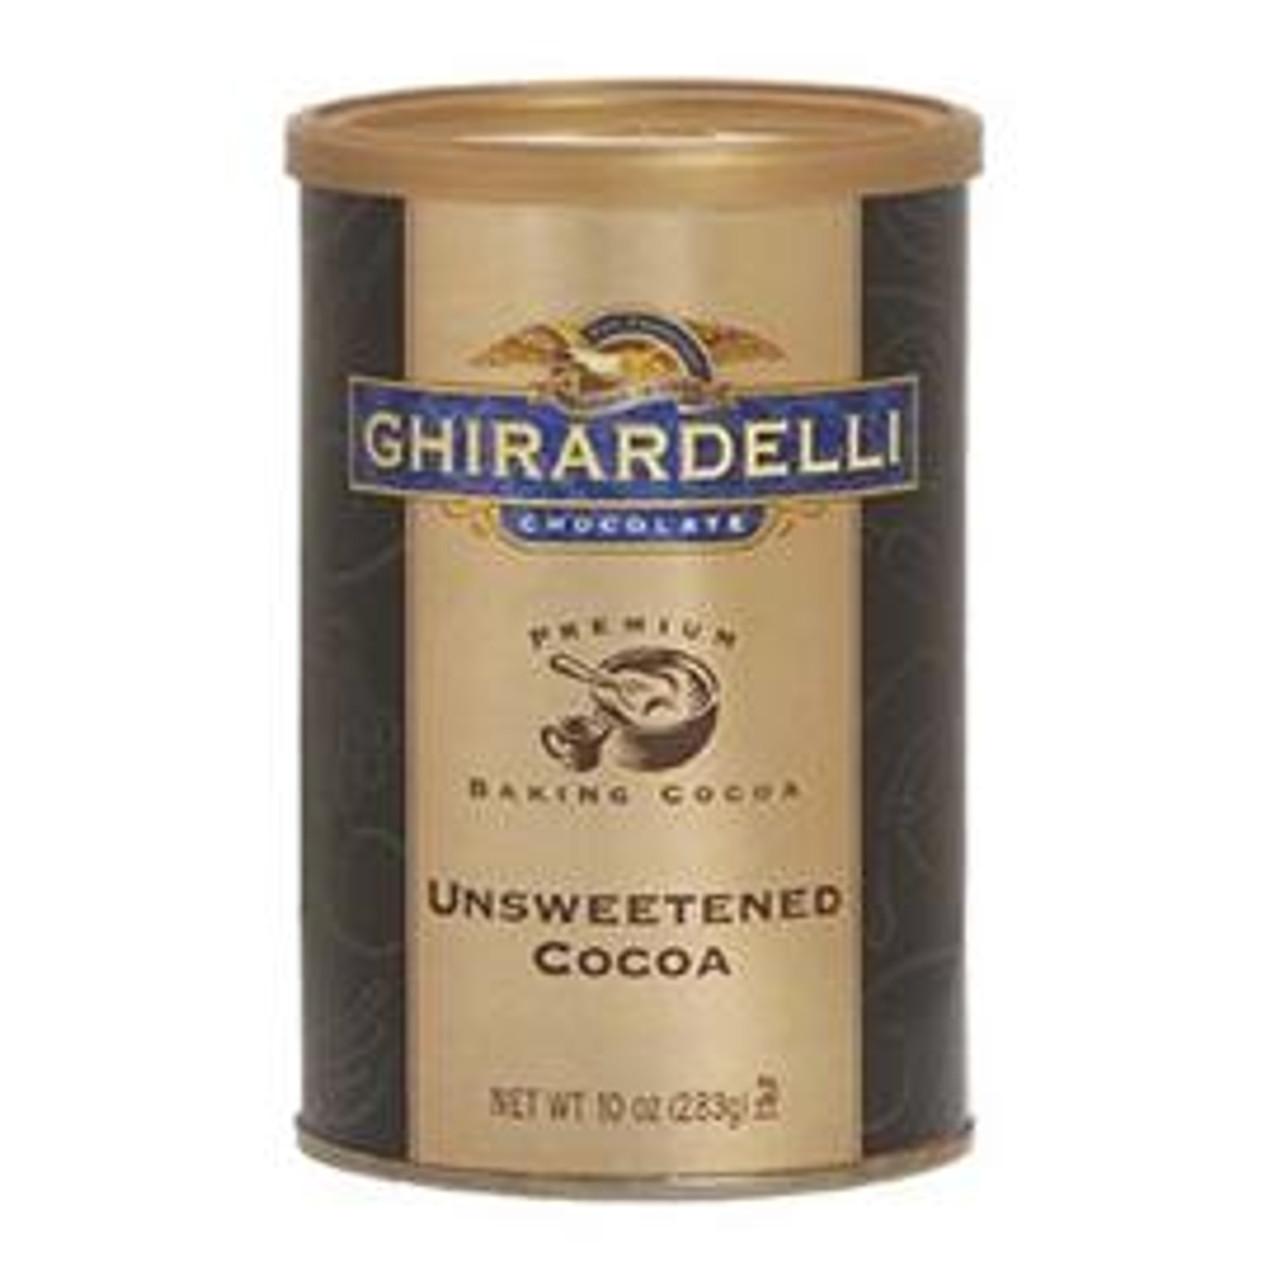 Unsweetened Cocoa